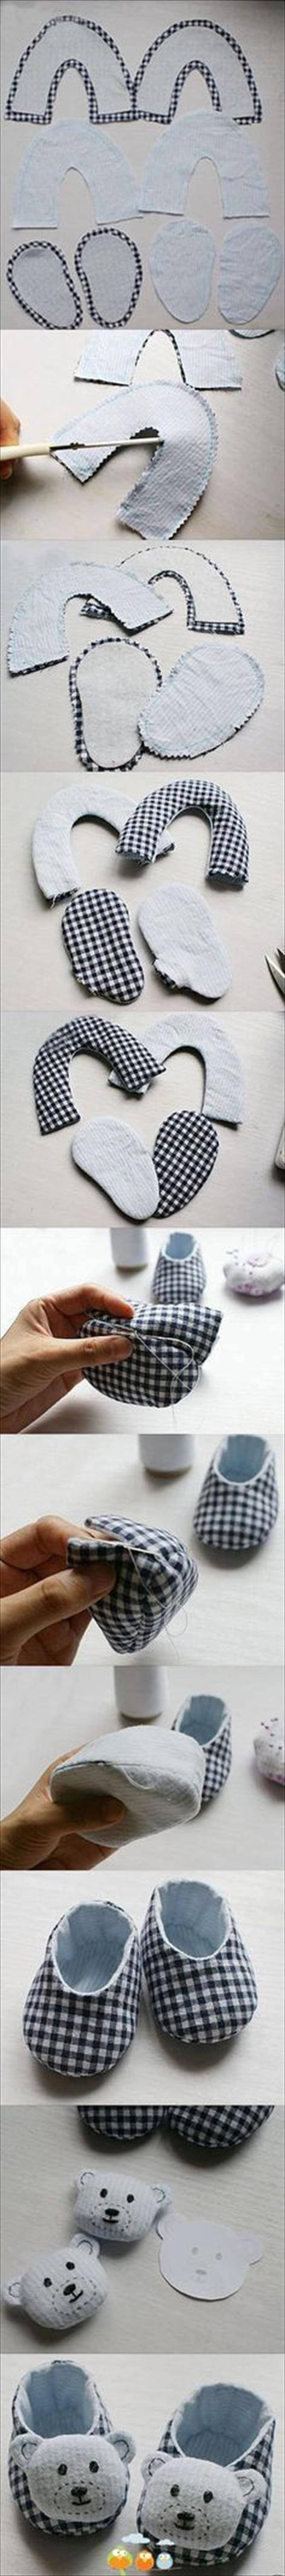 handmade animal inspired DIY baby booties